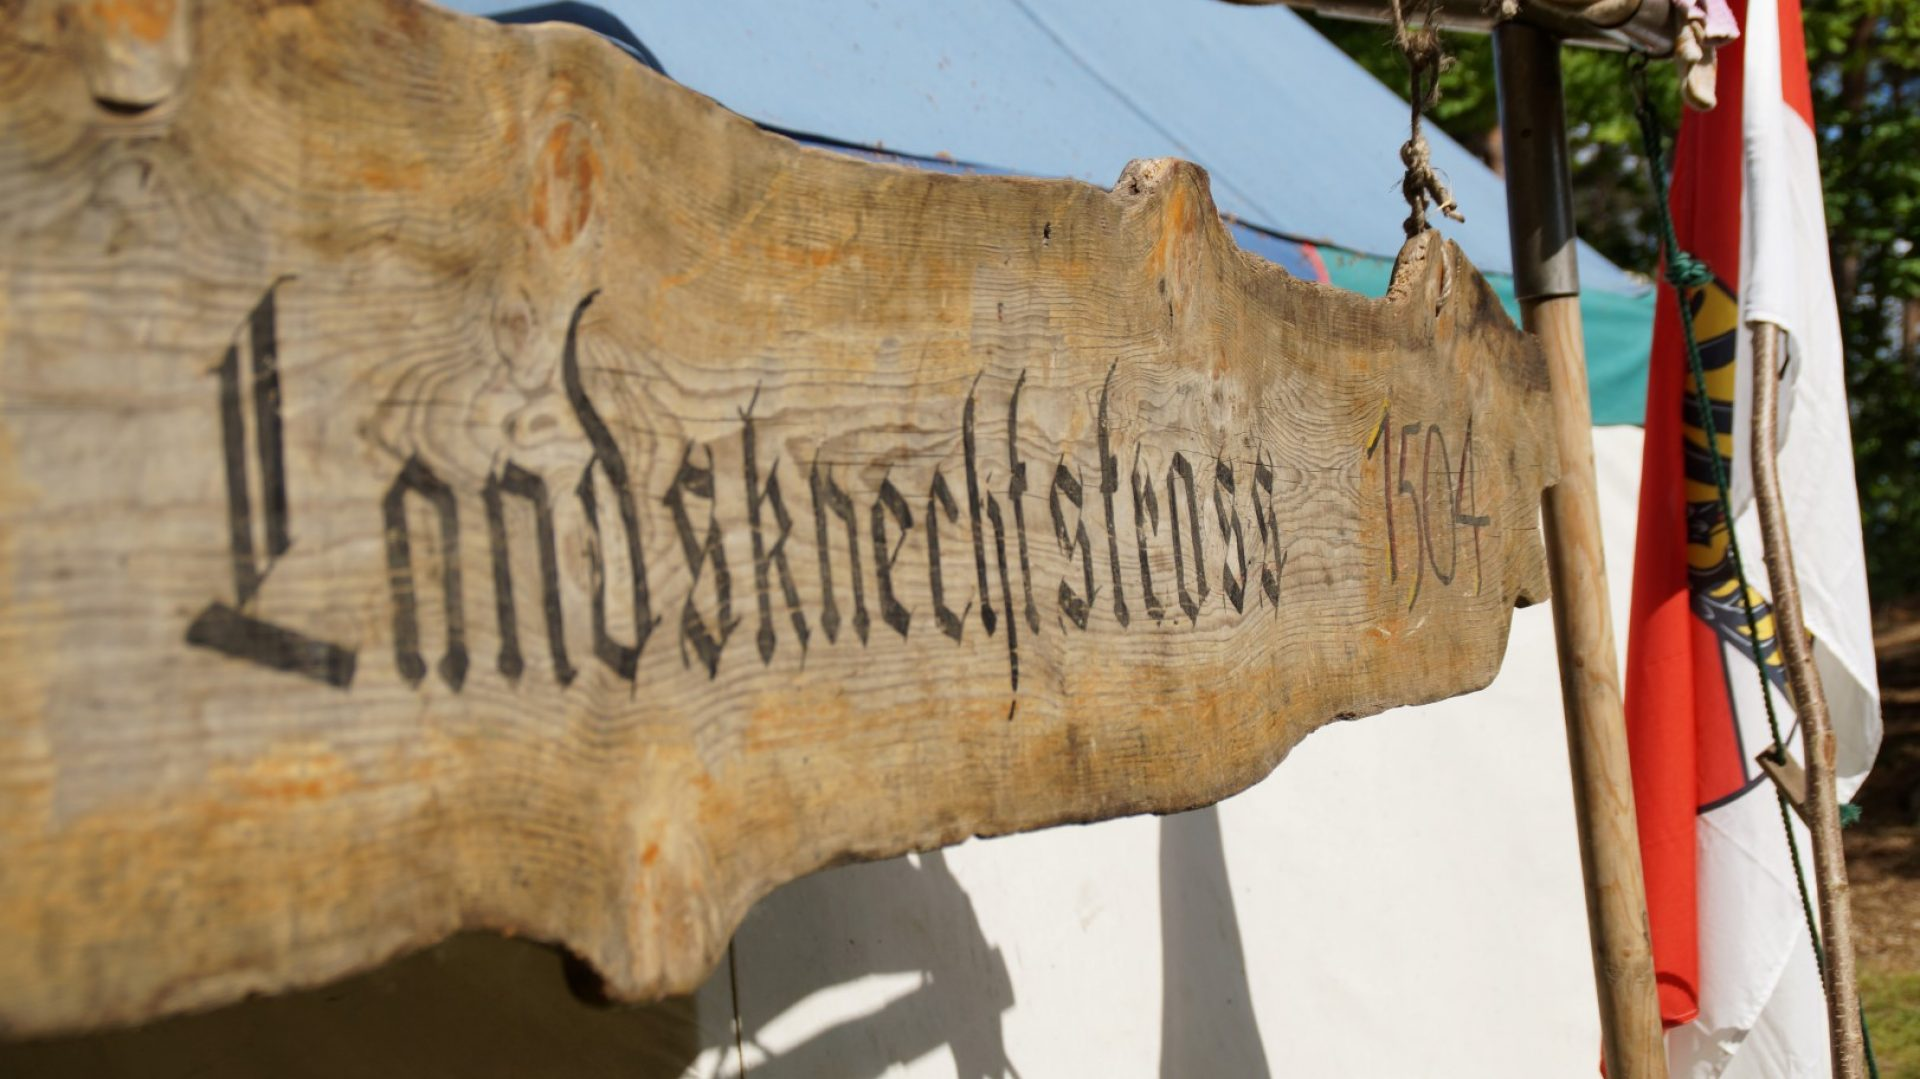 Landsknechtstross 1504